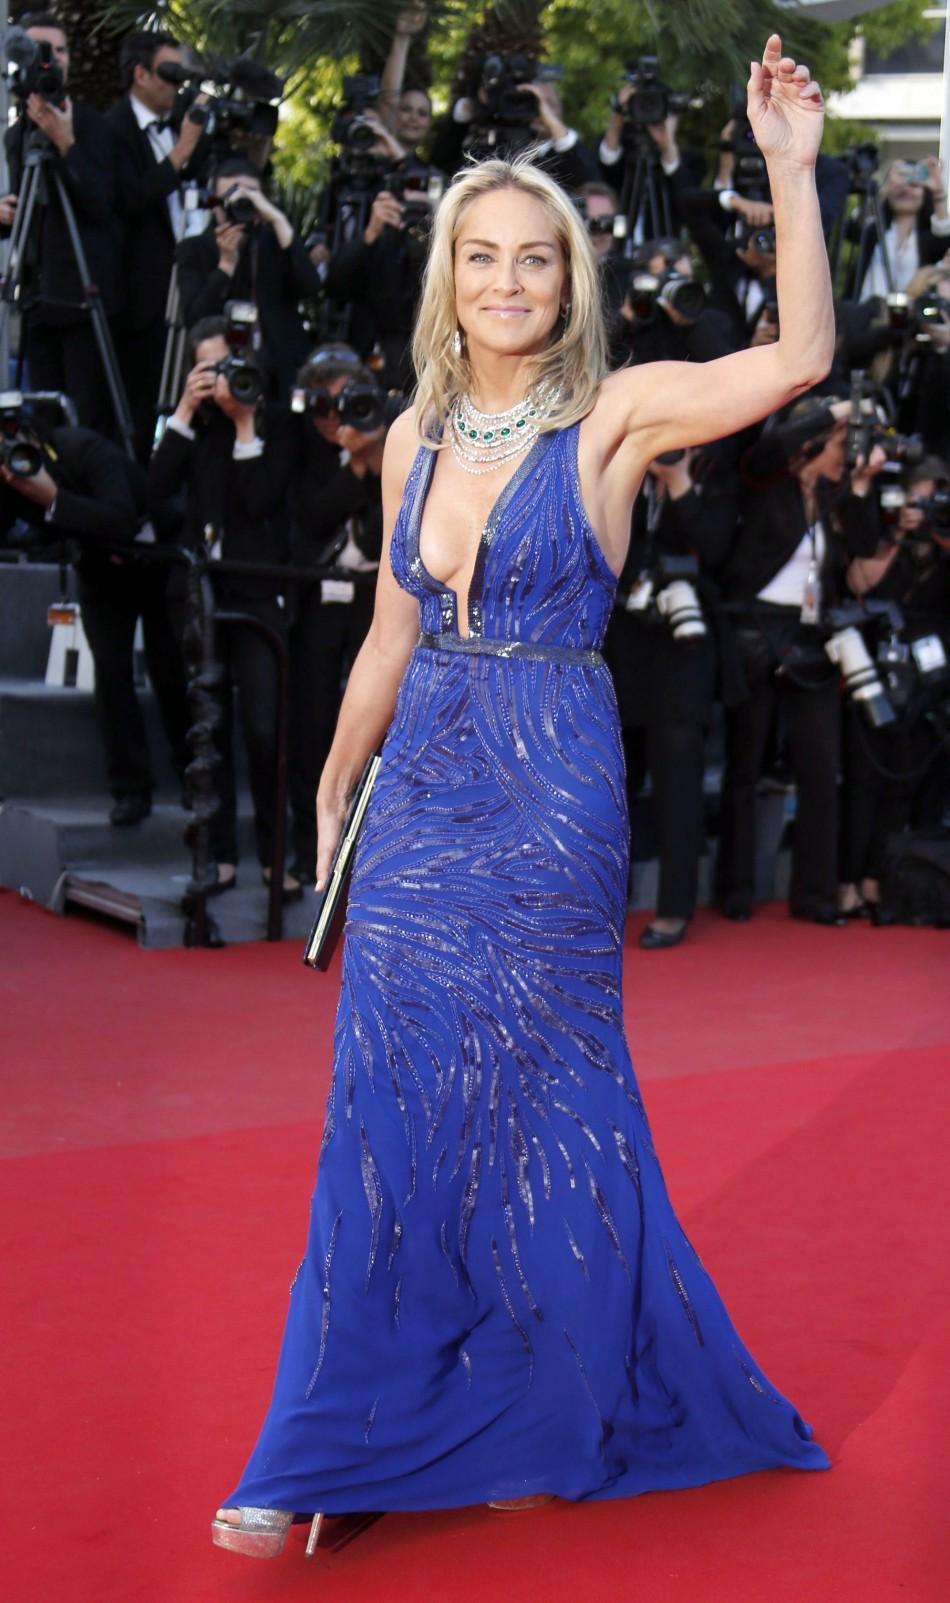 Cannes Film Festival 2013: Celebrities on Red Carpet